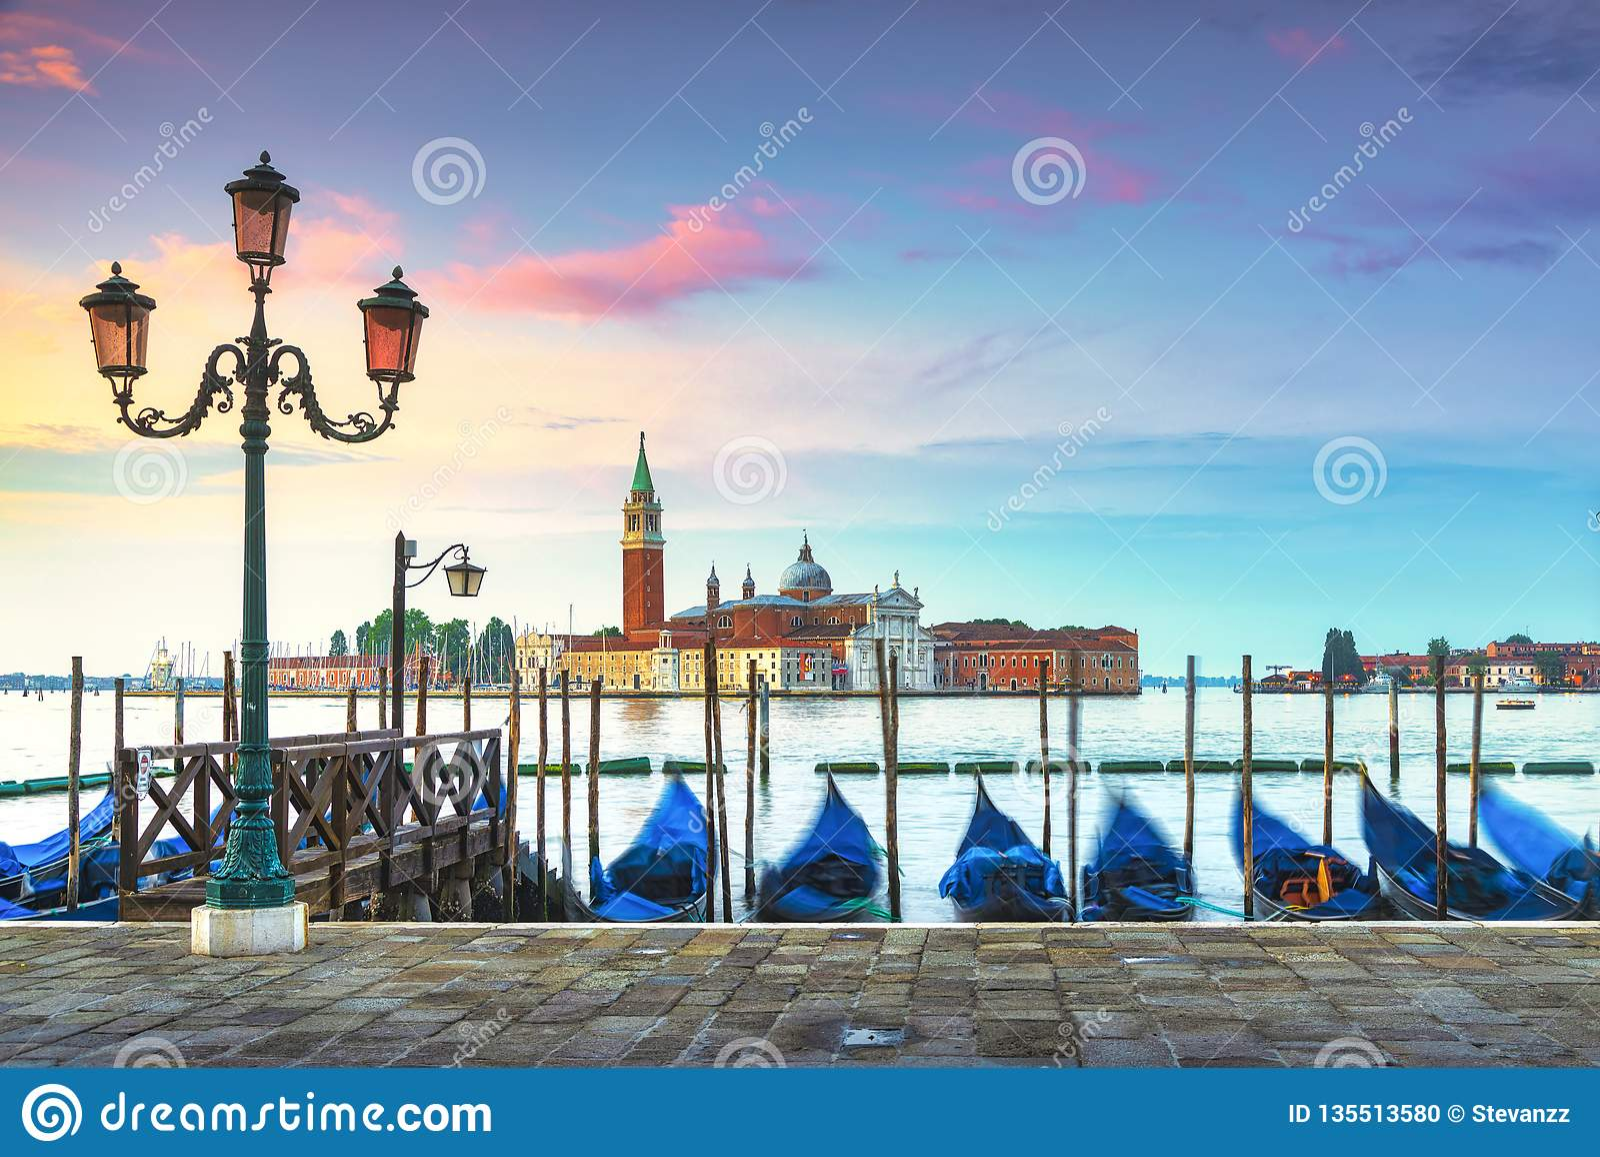 Venice lagoon, San Giorgio church, gondolas and poles. Italy